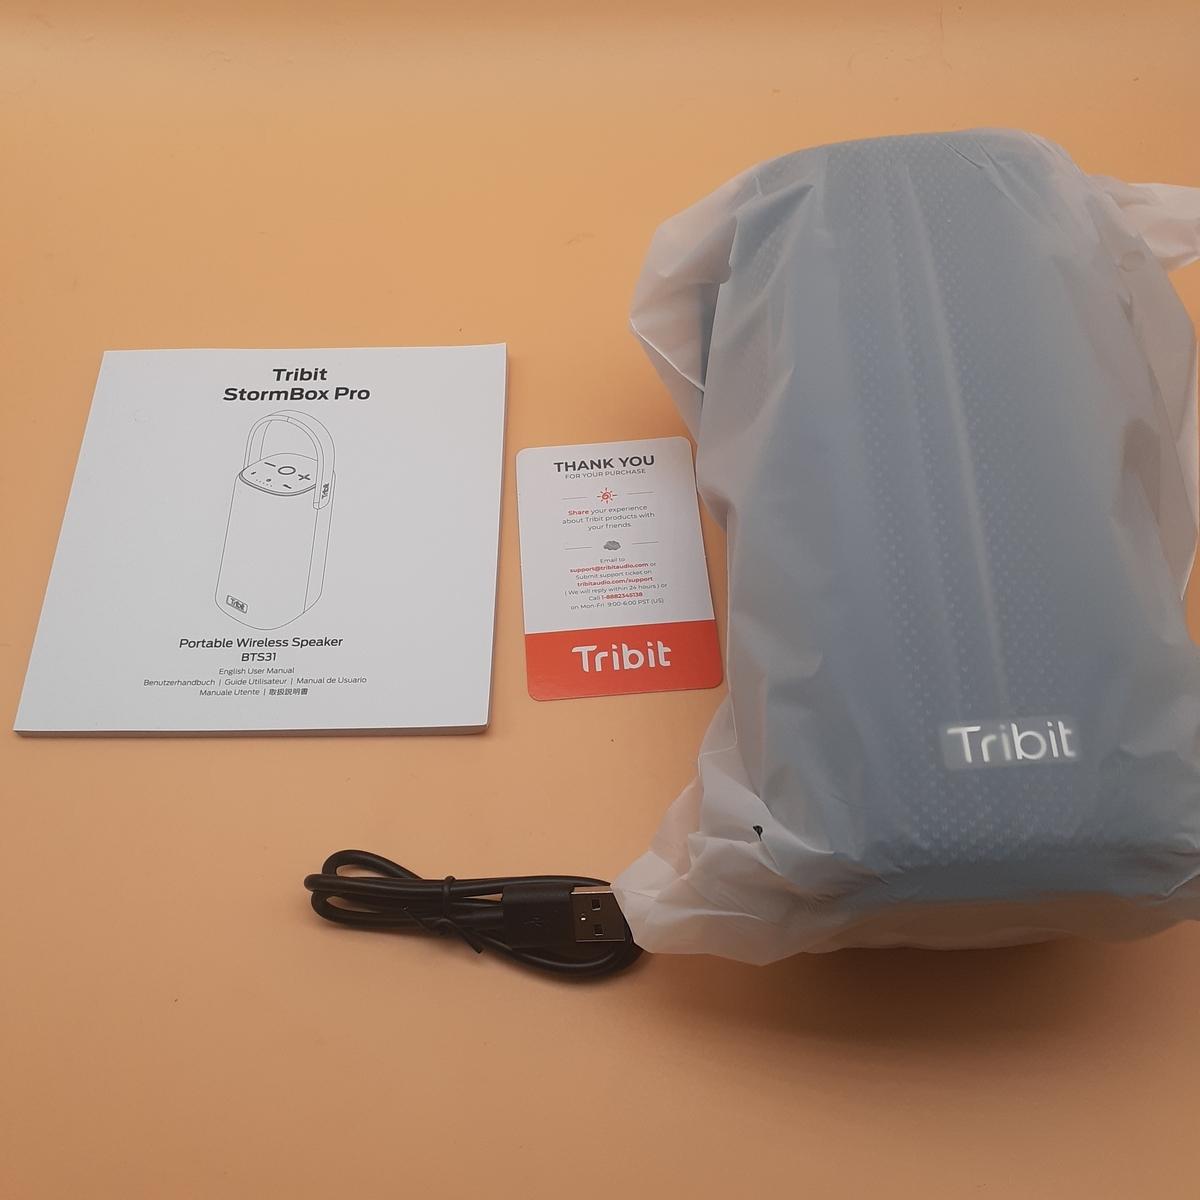 Tribit StormBox Pro